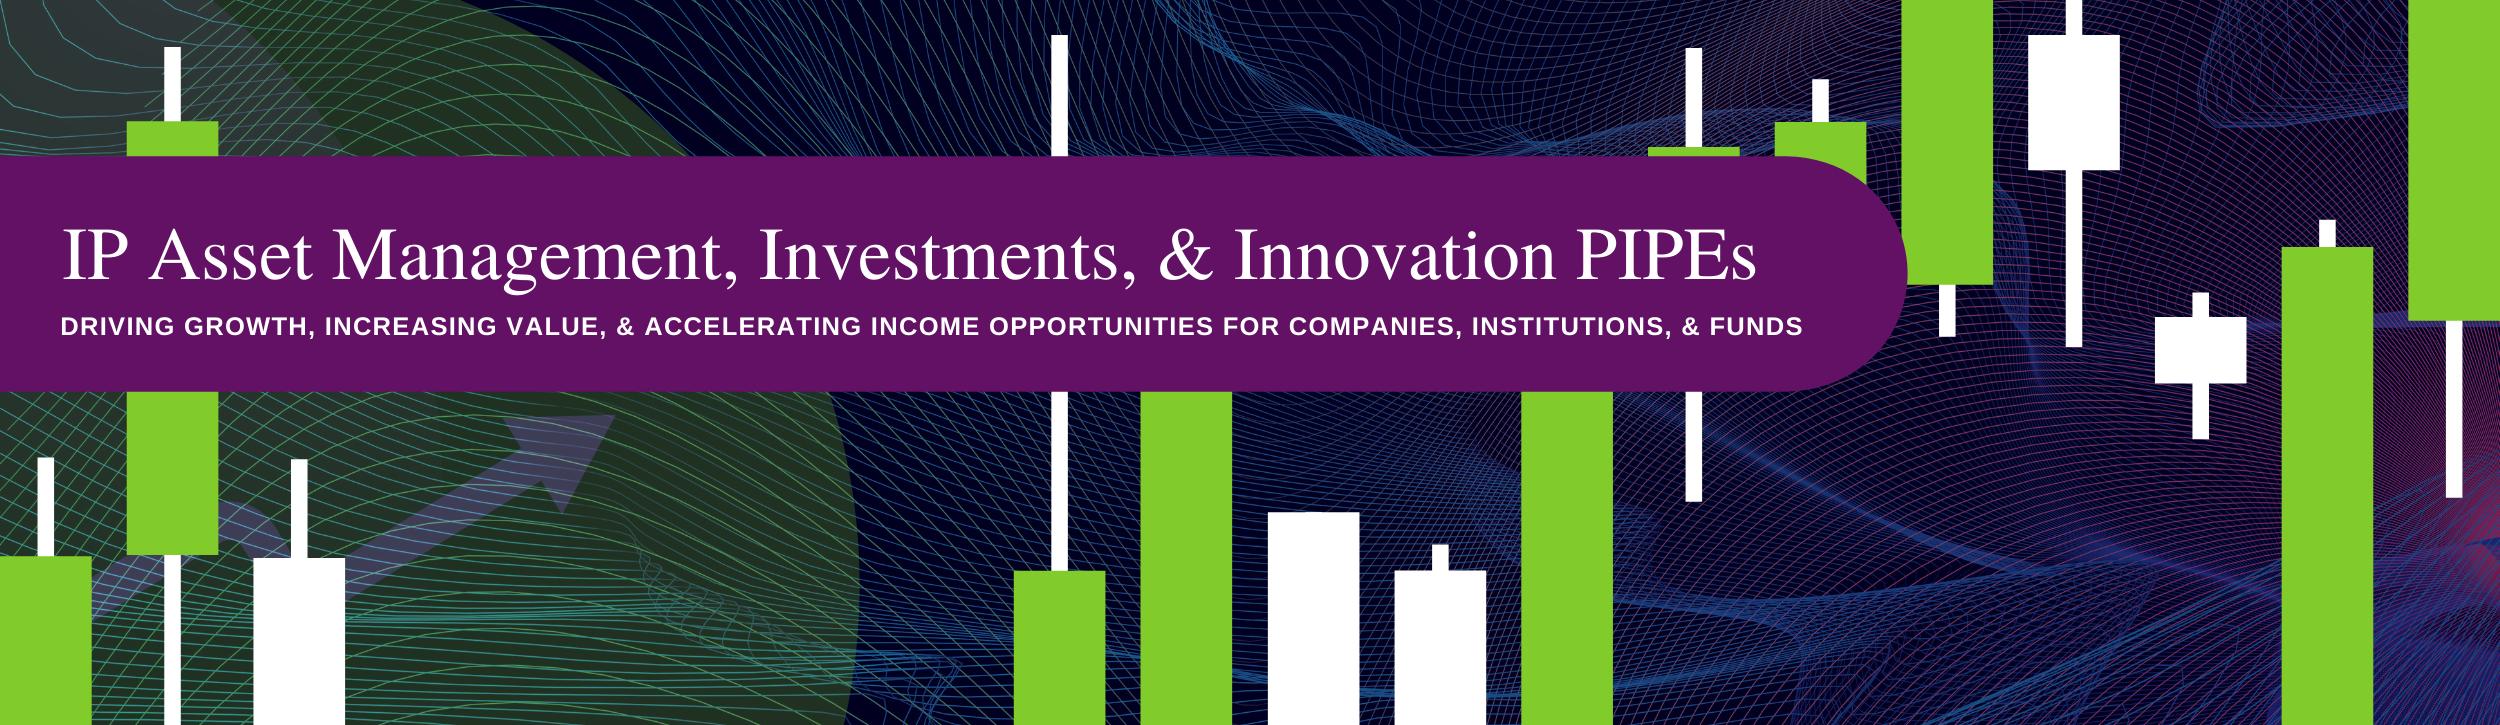 Public Company Growth